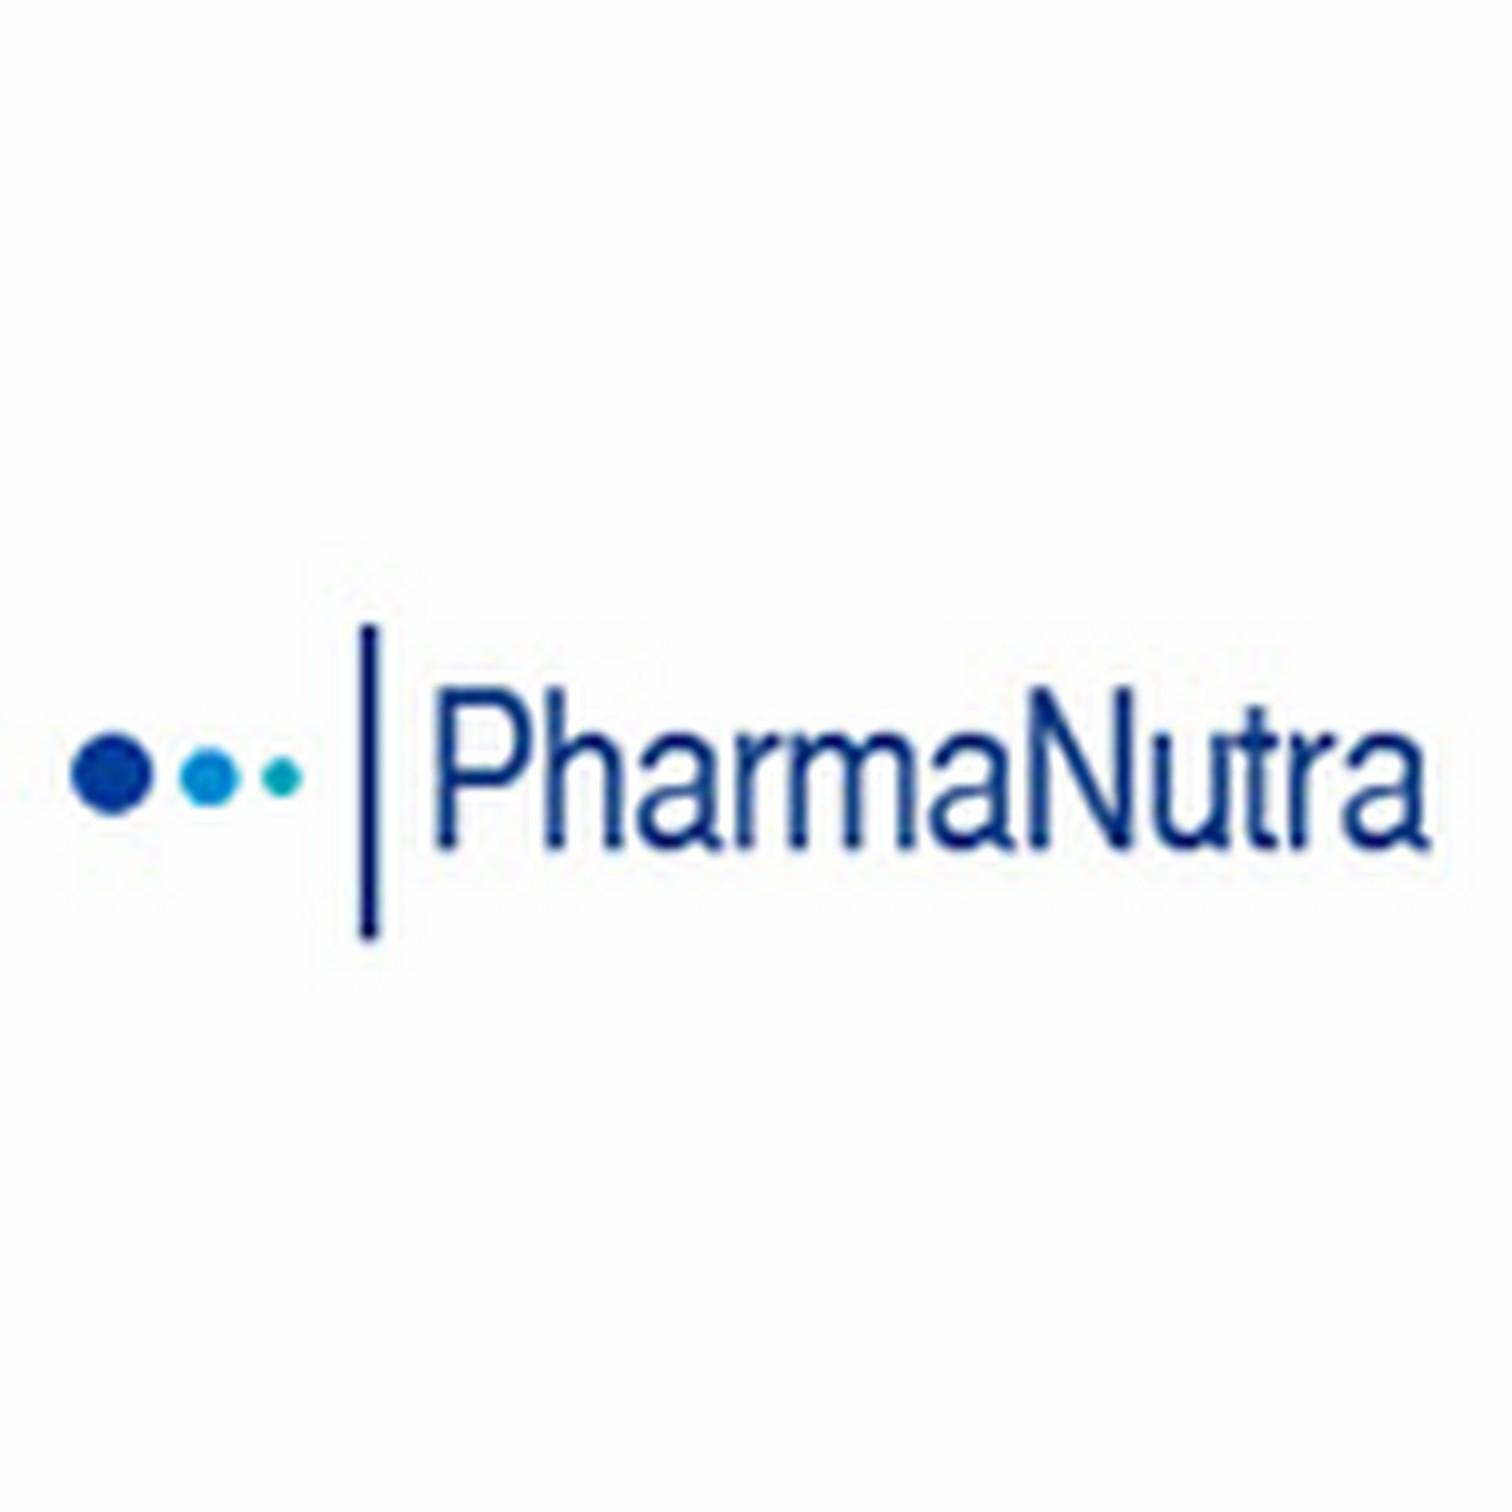 Logo della marca Pharmanutra spa